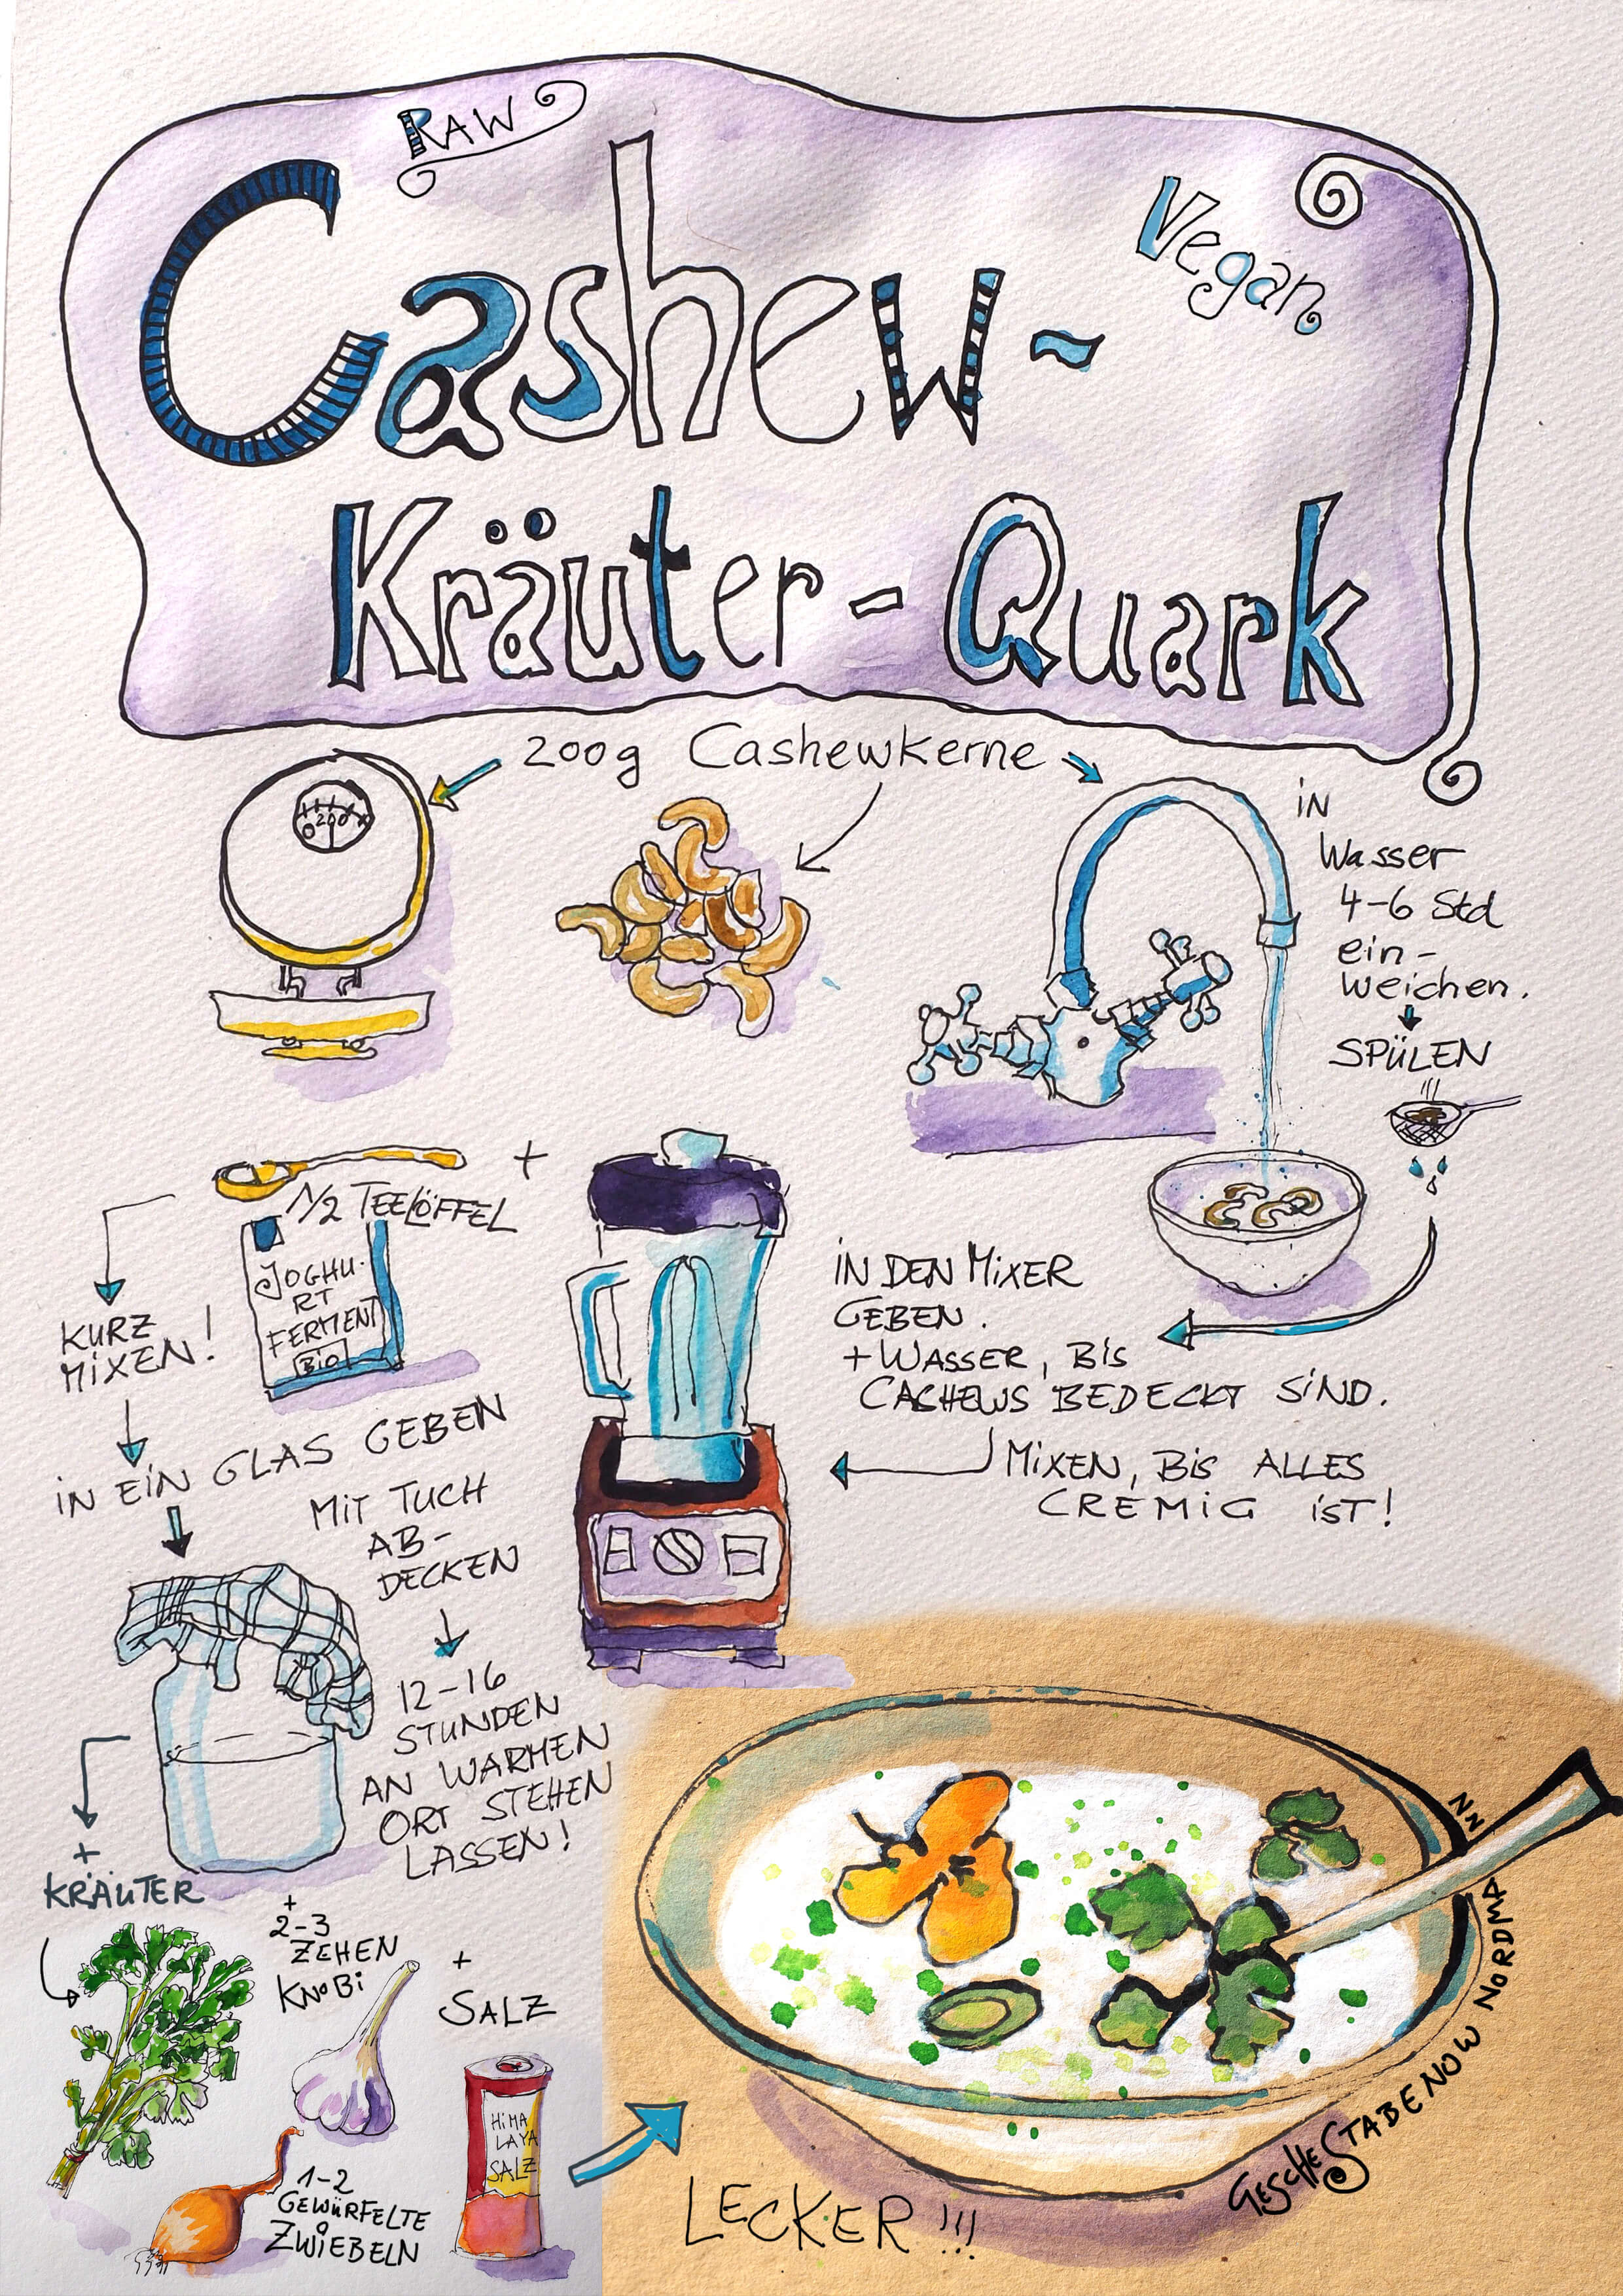 Cashewquark